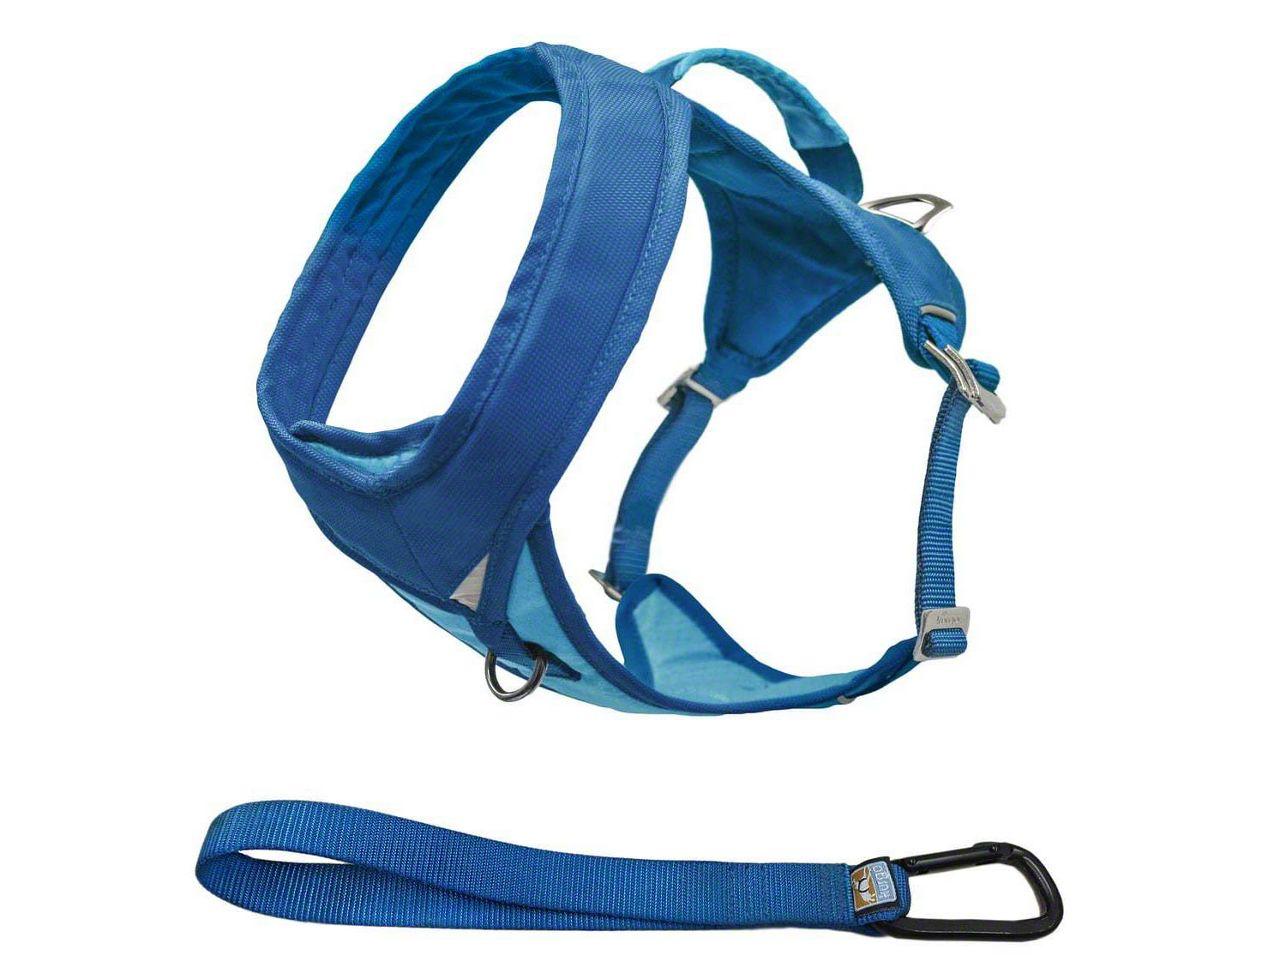 Kurgo Go-Tech Adventure Dog Harness - Black (07-18 Sierra 1500)